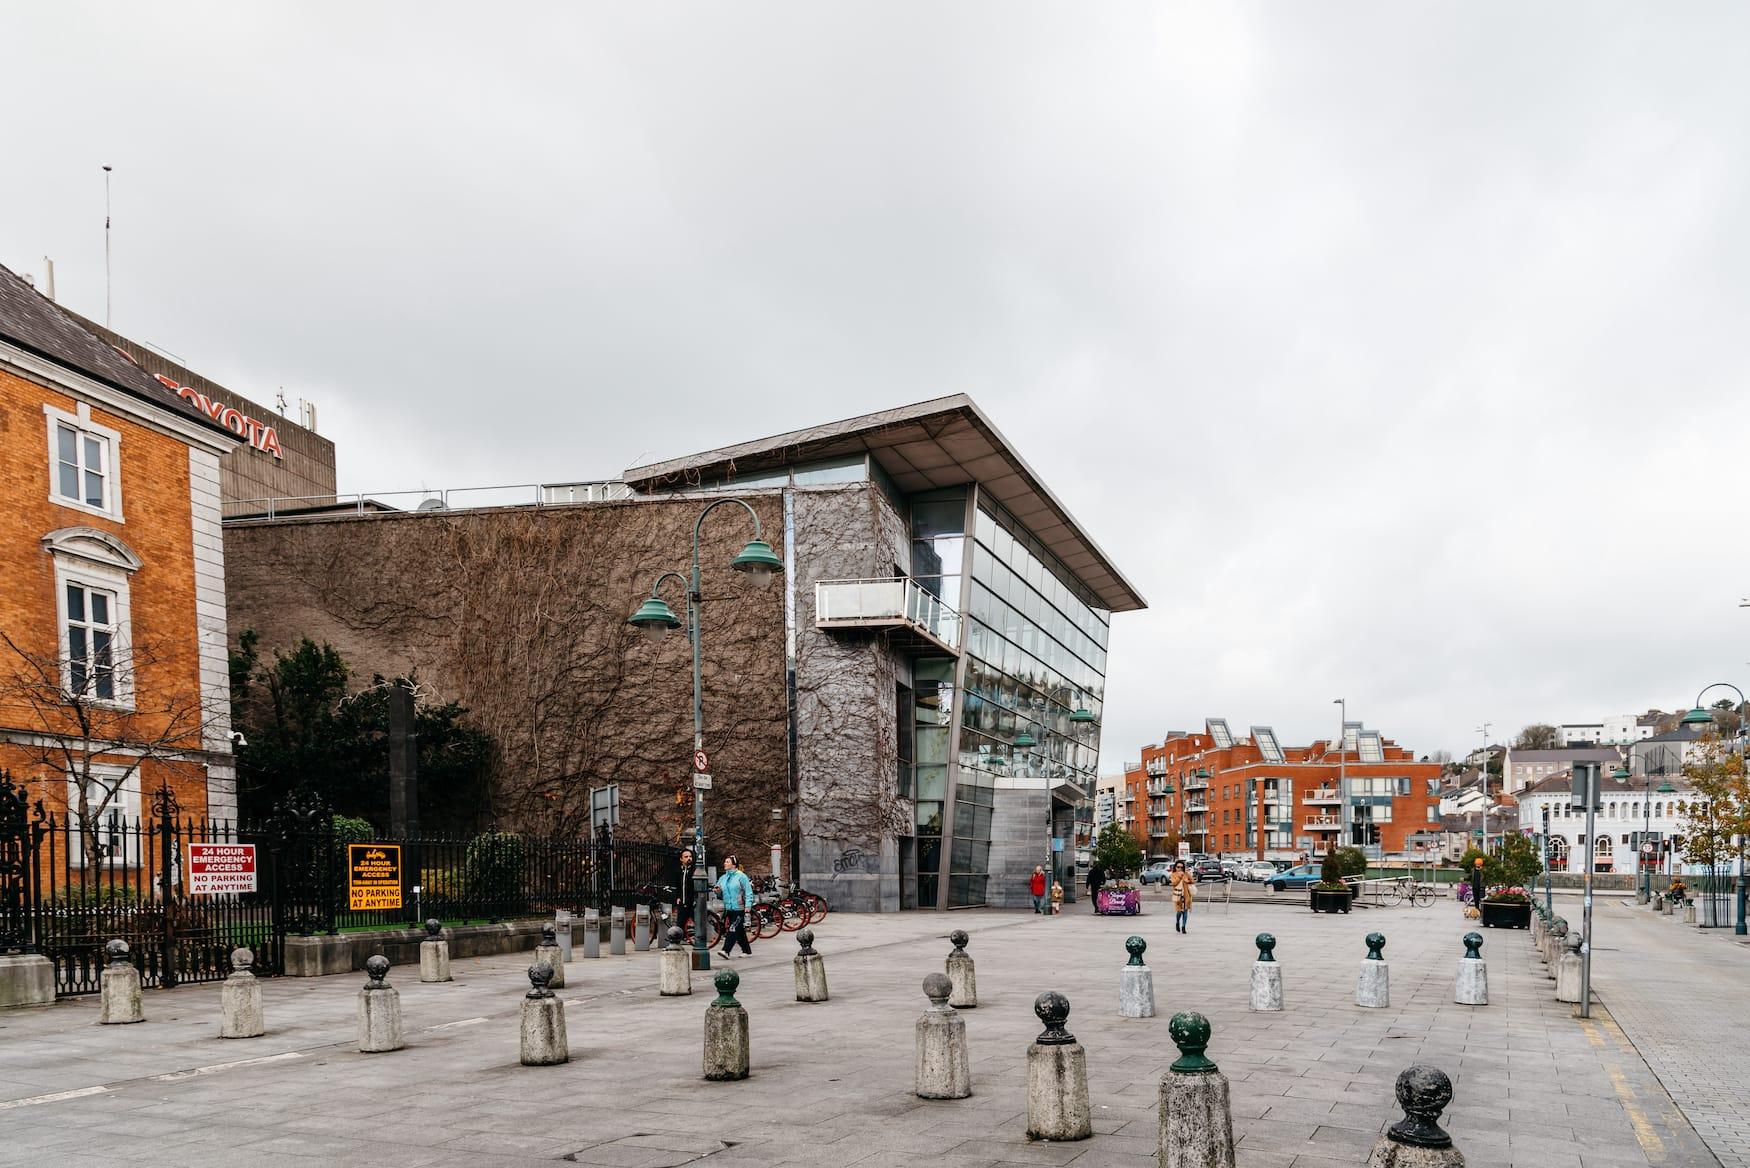 Cork Opera House am Emmet Square